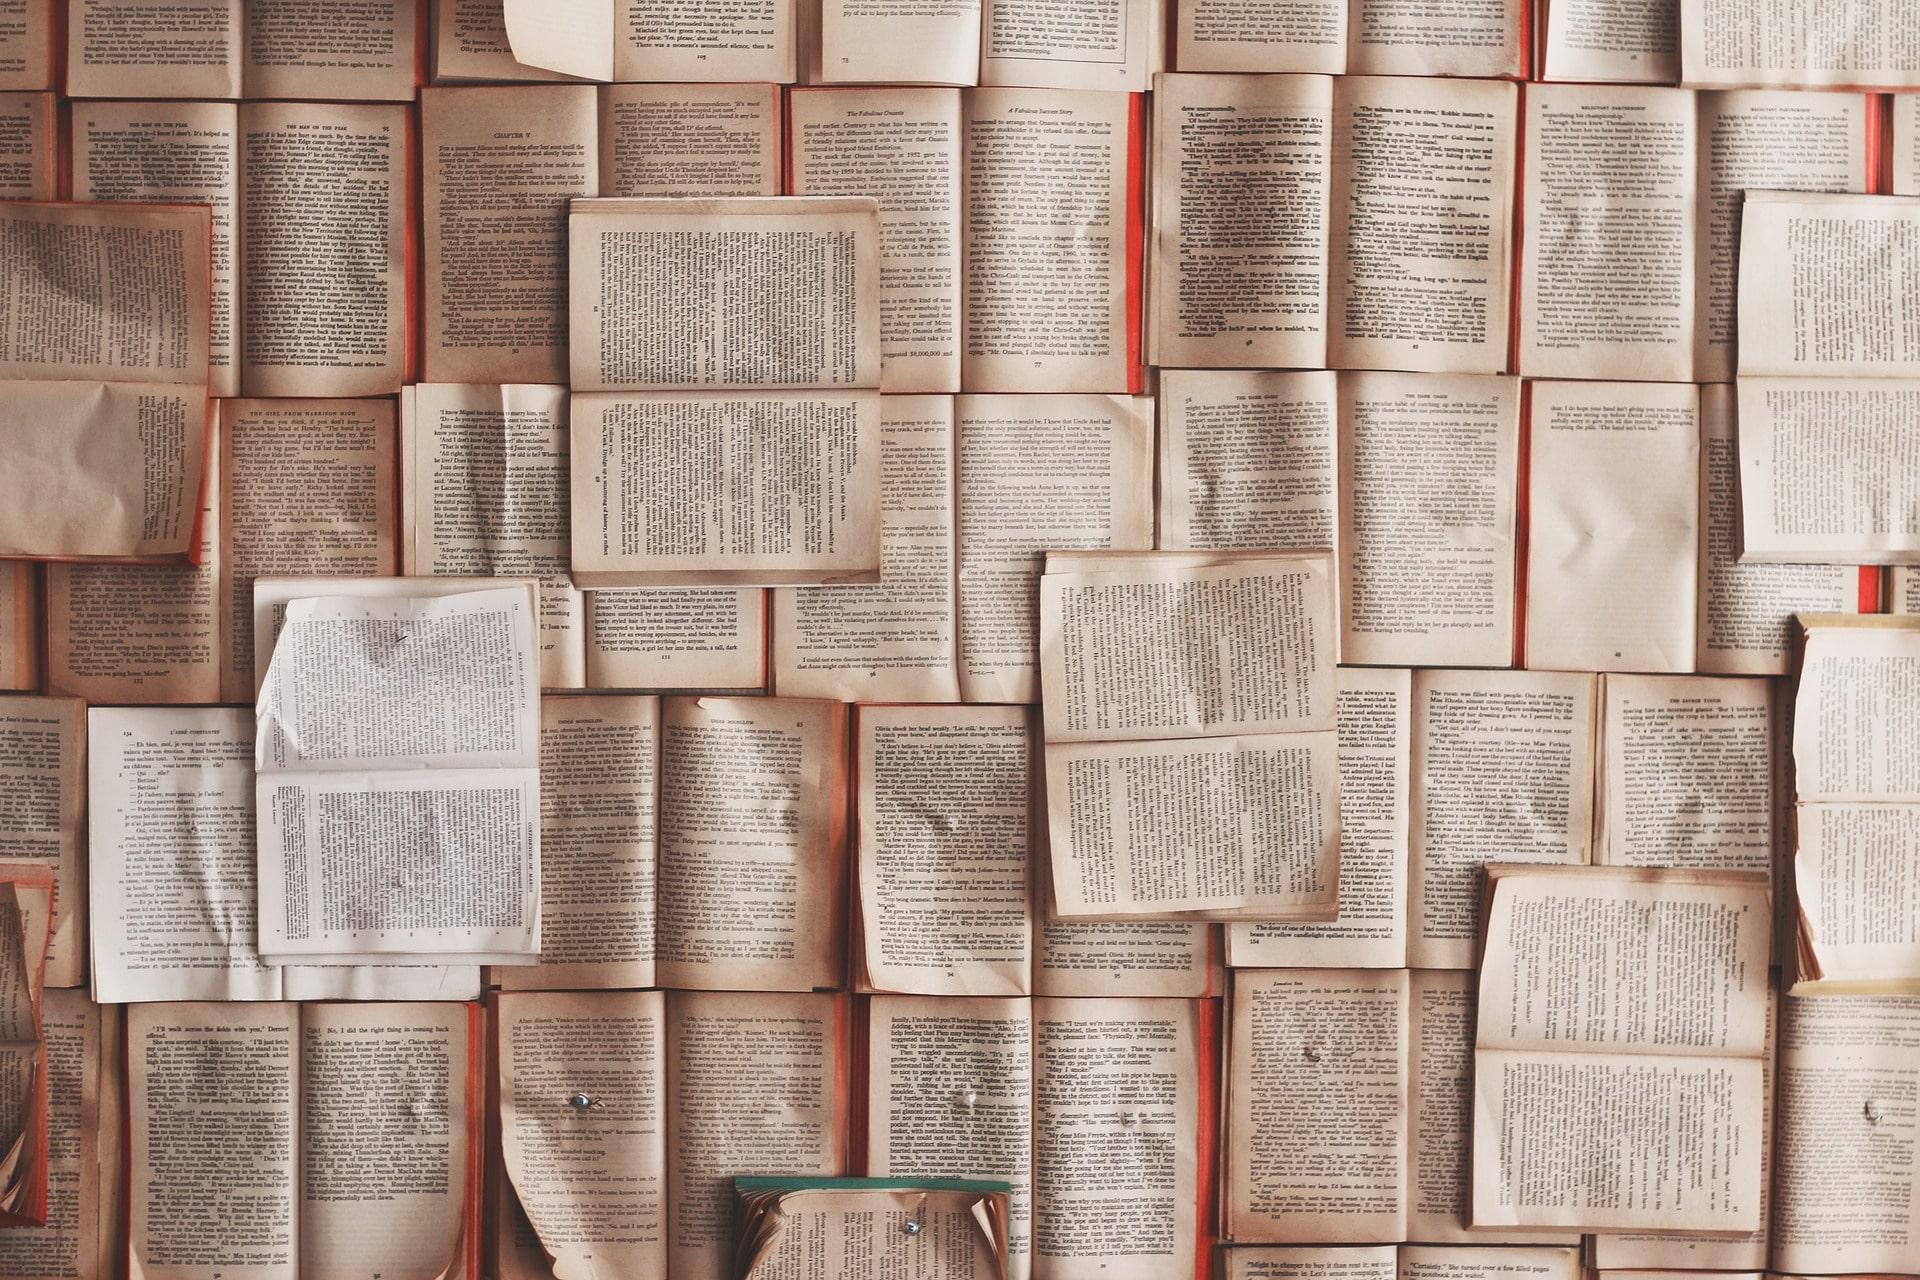 overlapping open books